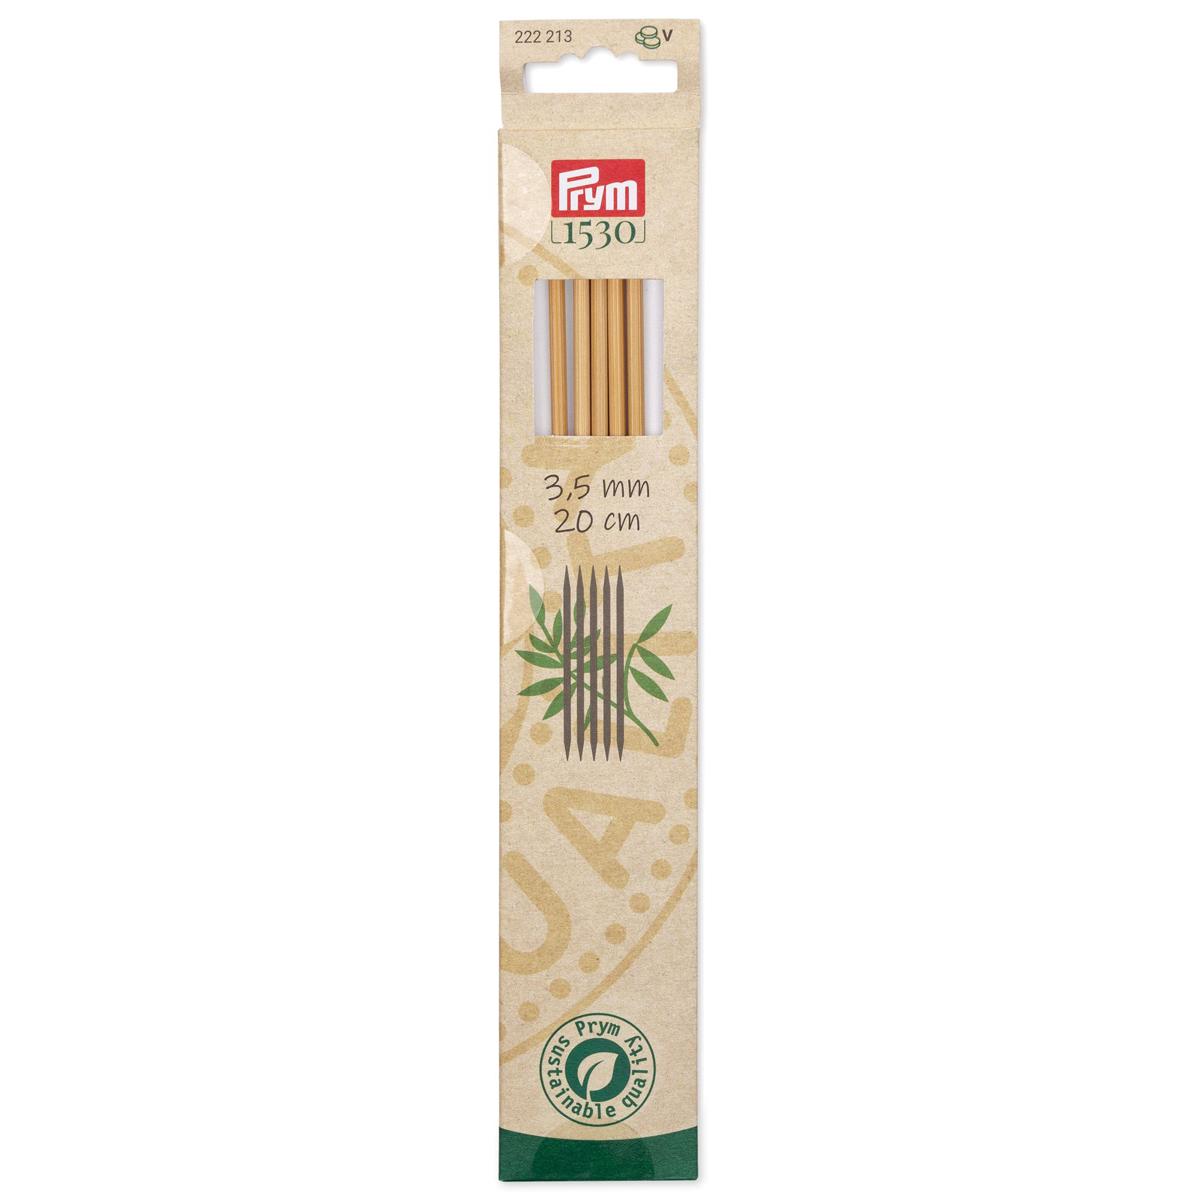 222213 Спицы чулочные, бамбук, 3,5мм/20см, 5шт, Prym